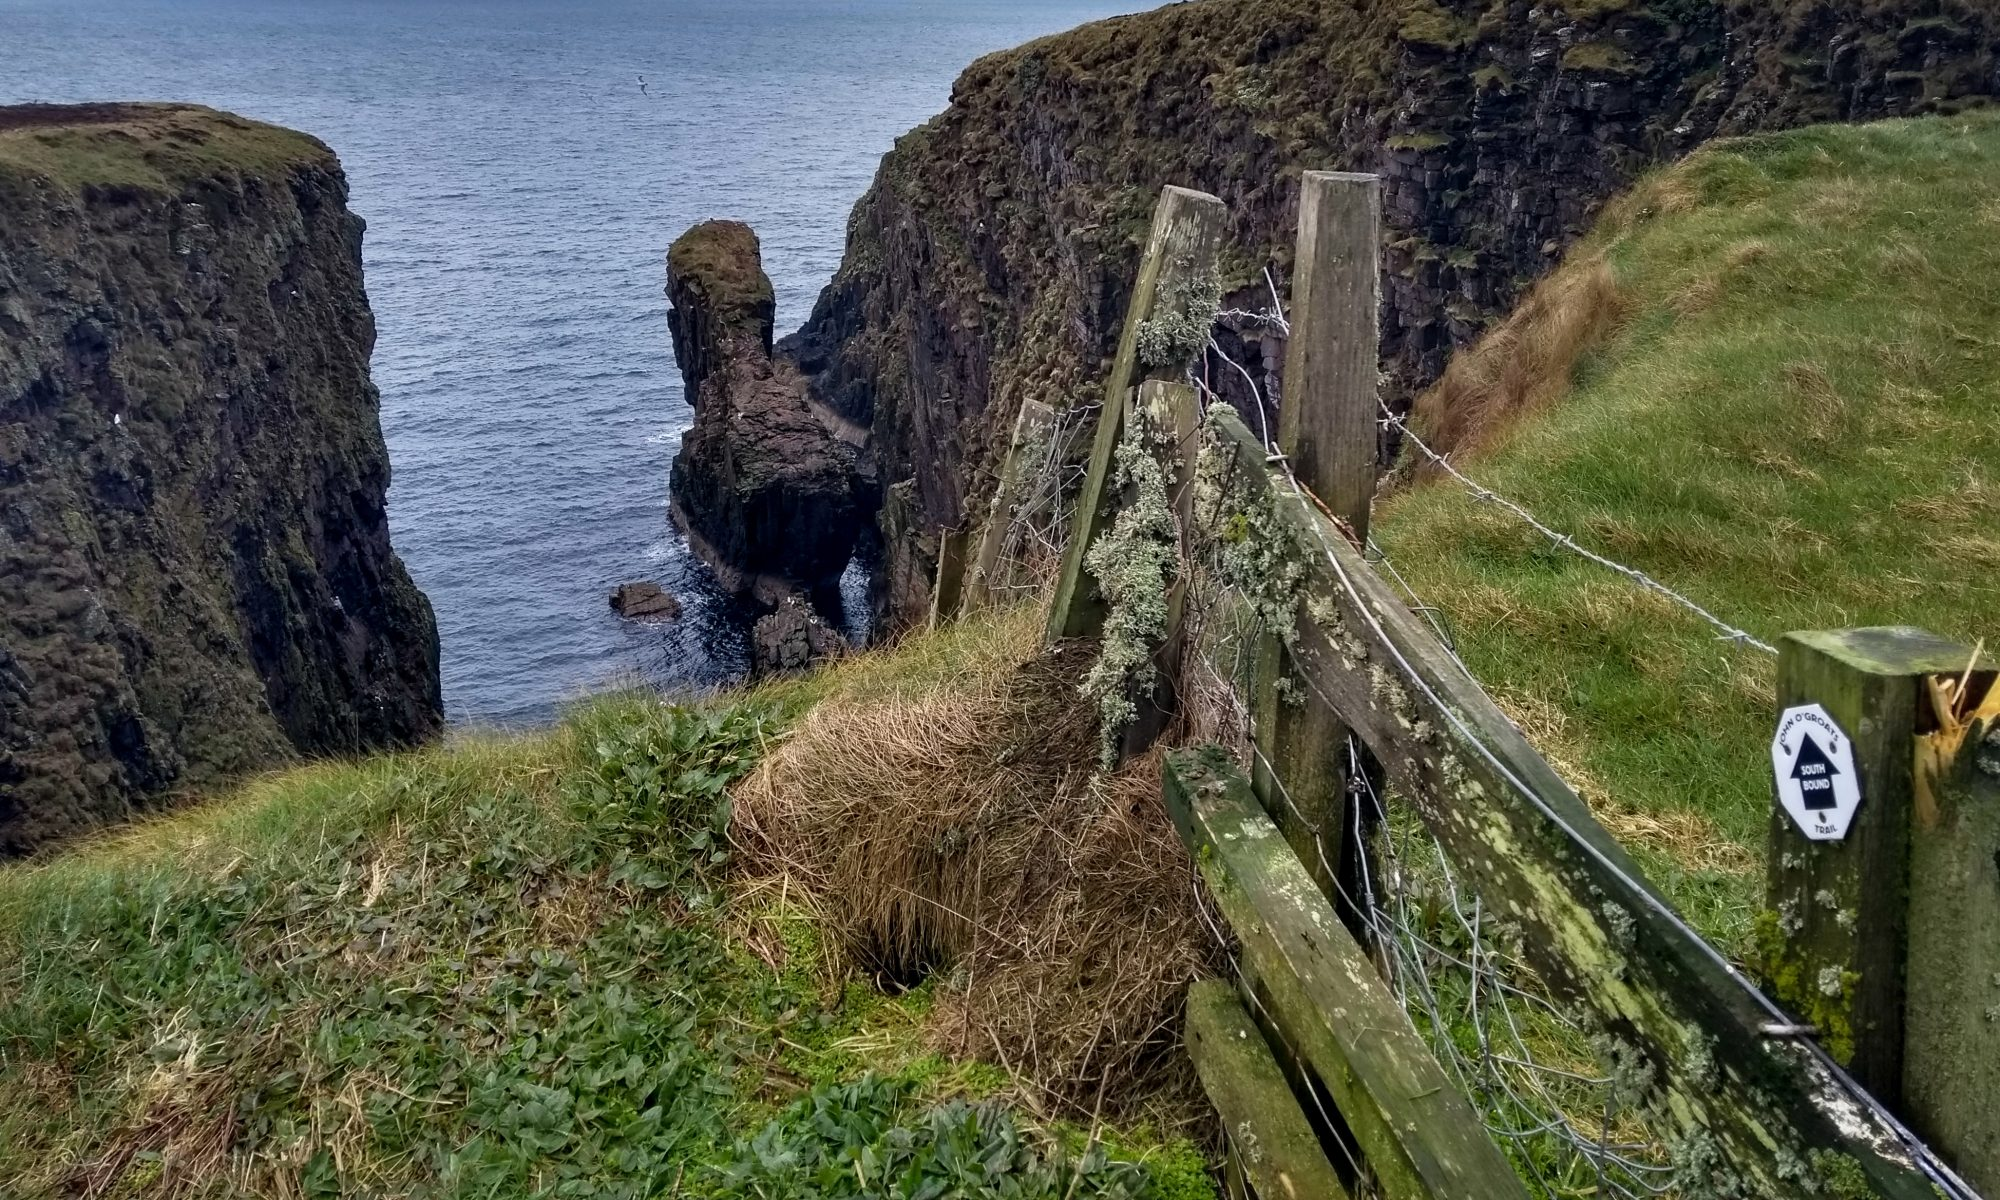 Zaunüberquerung auf dem John o'Groats Trail